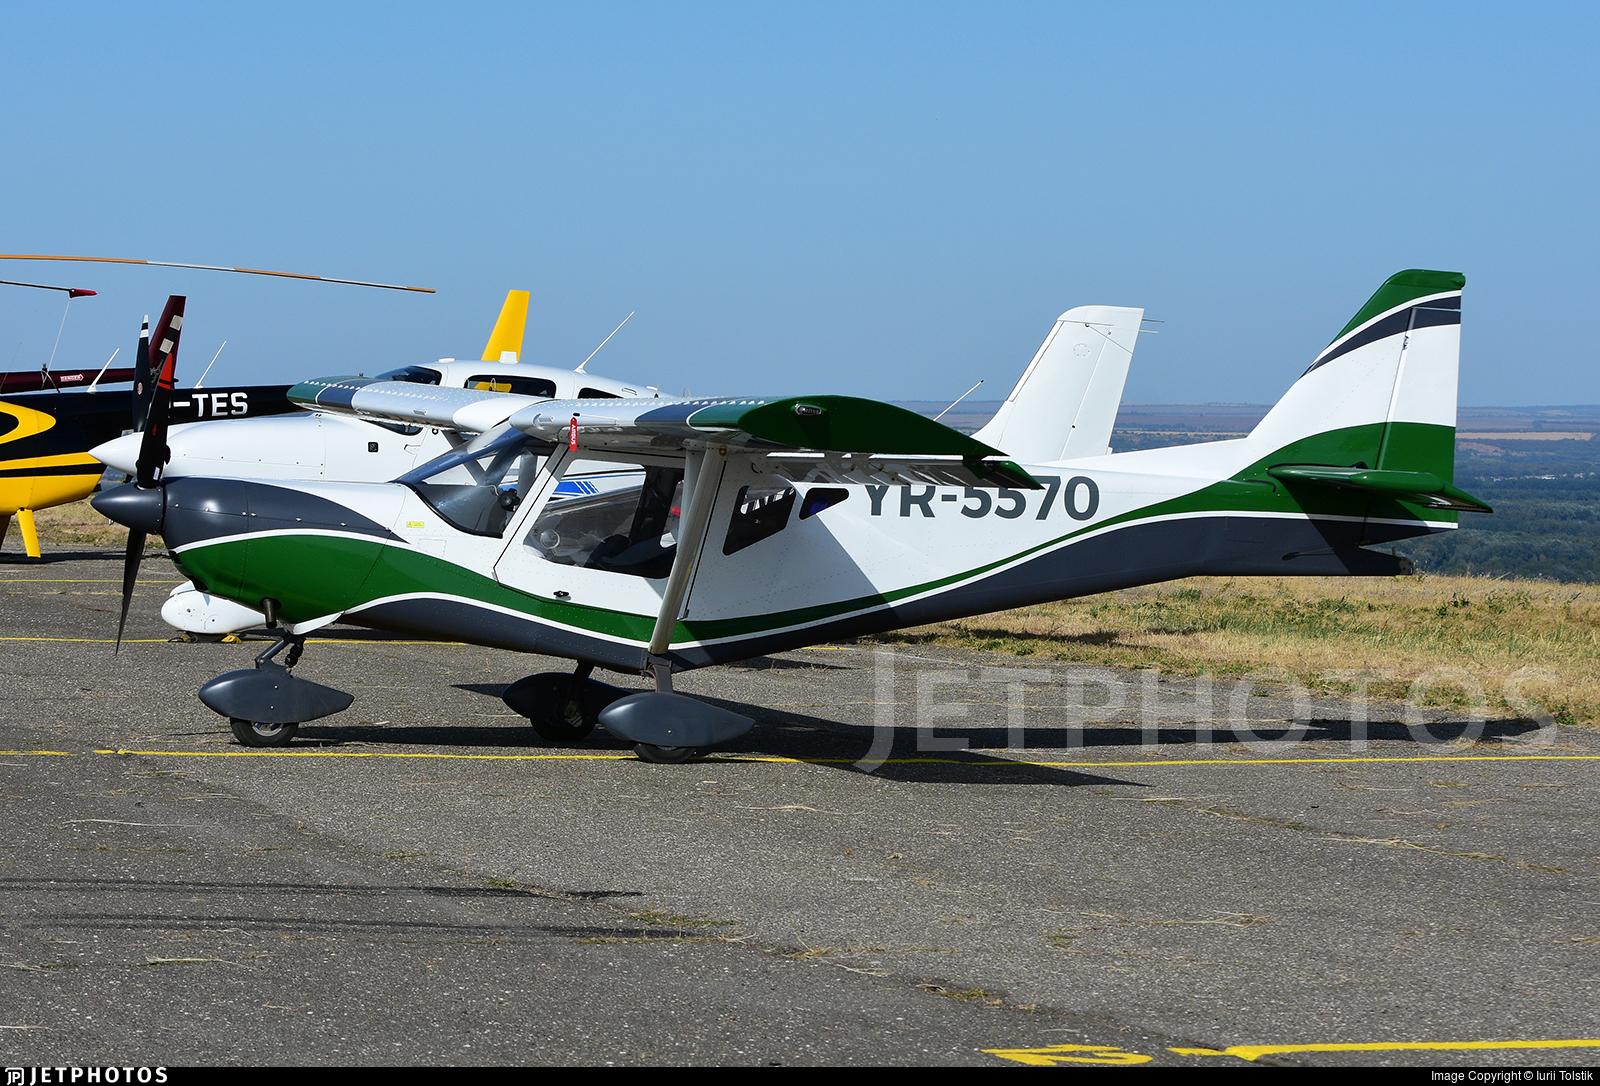 YR-5570 - ICP Ventura 4 - Private